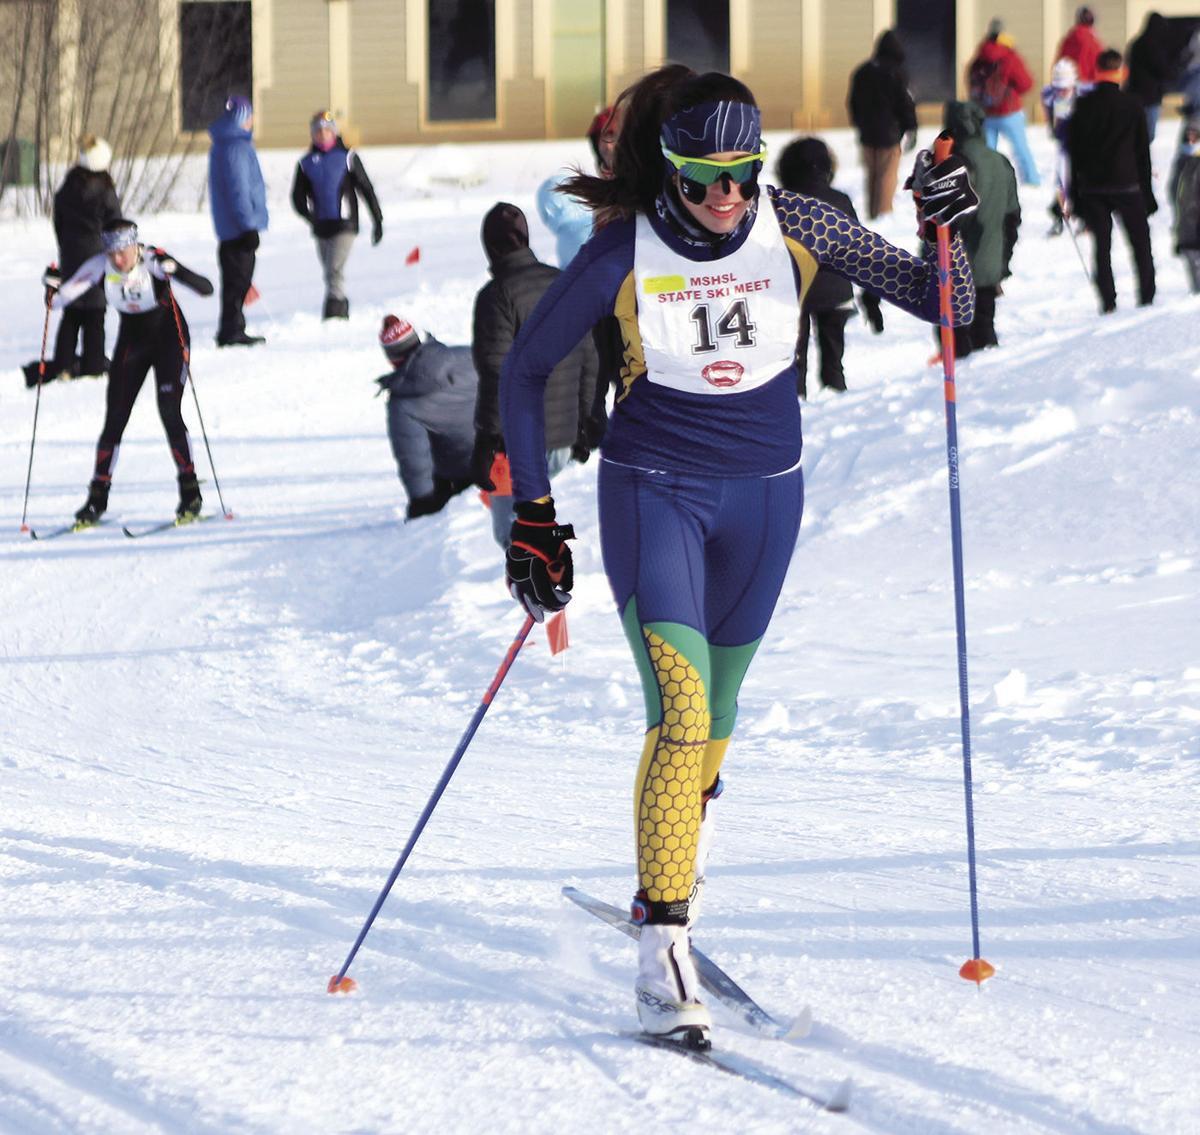 Dakota County Tribune winter sports recap: Promising start, unsatisfying finish